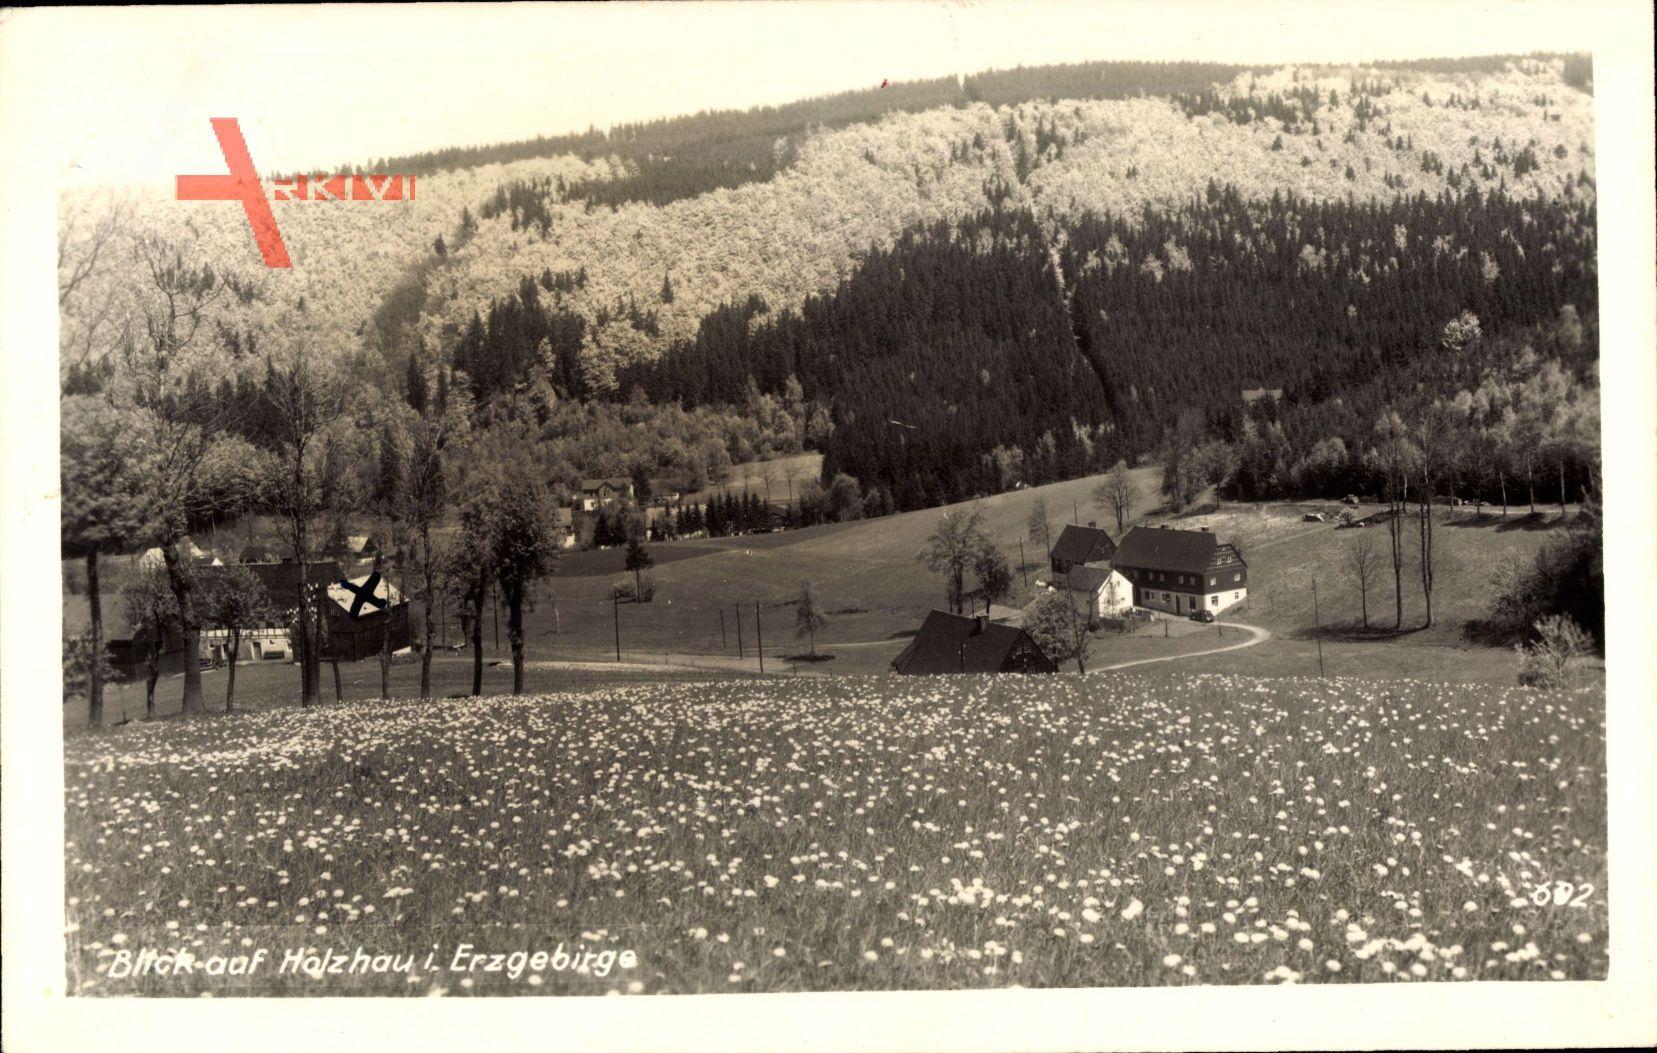 Holzhau Rechenberg Bienenmühle Erzgebirge, Frühling, Ort, Felder